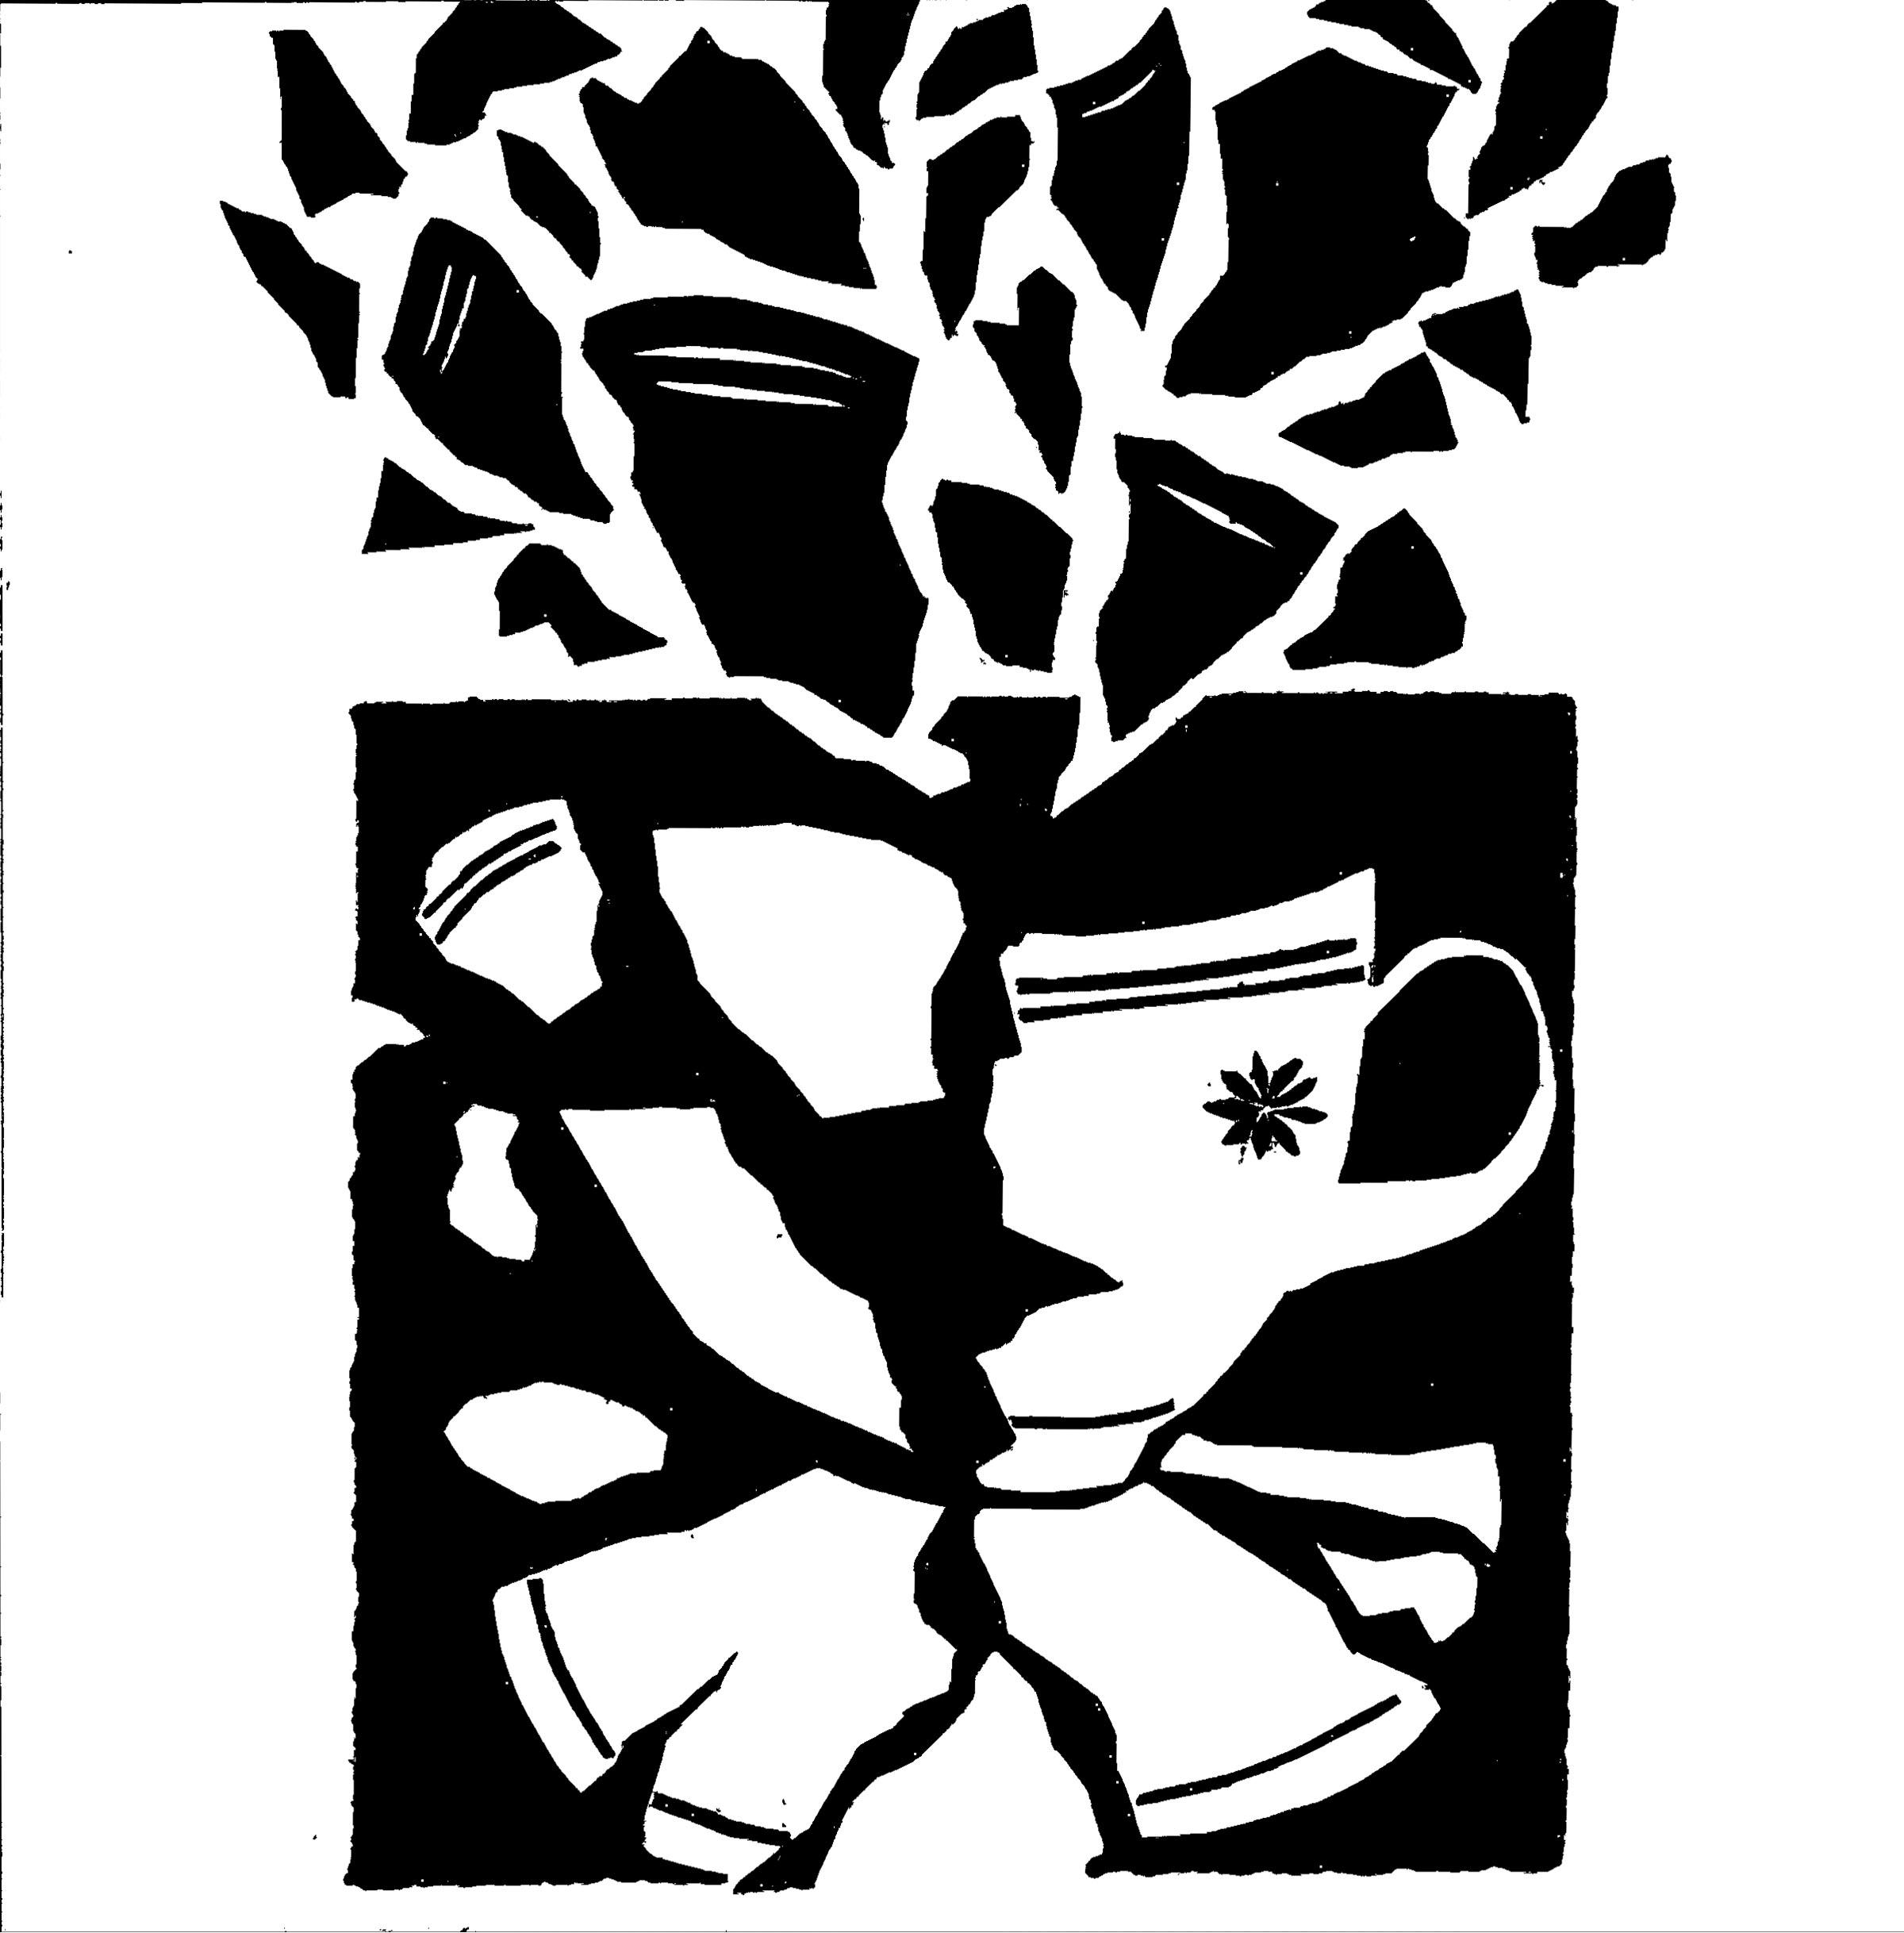 Closure: Broken Teacup